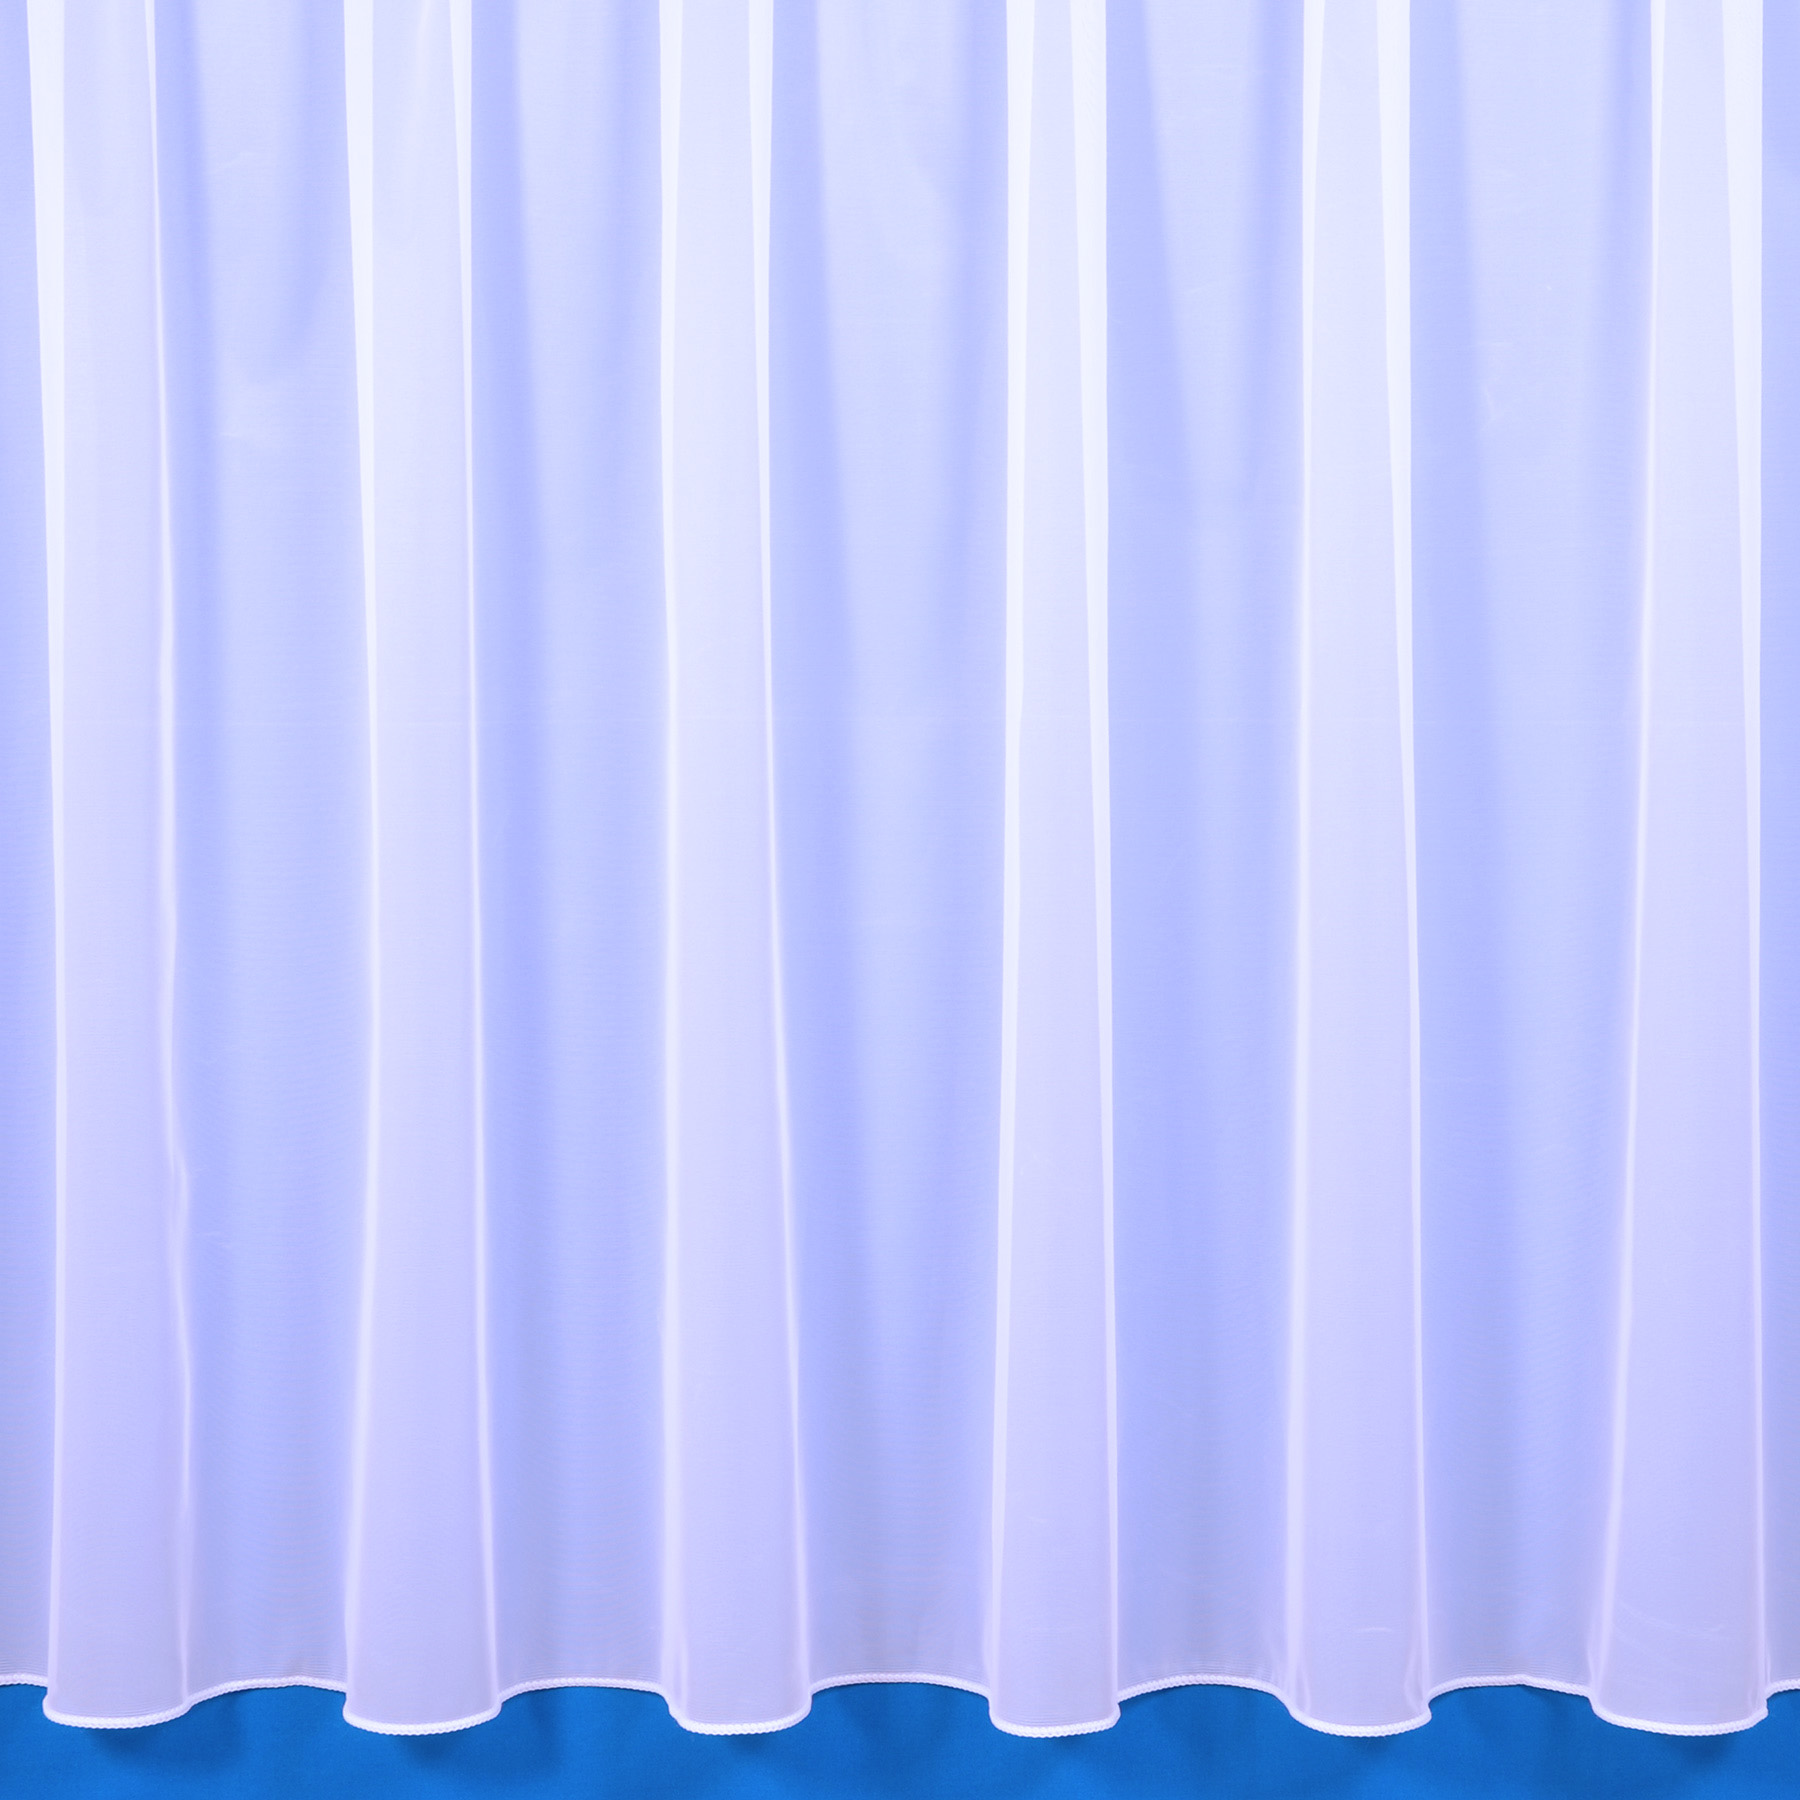 White Net Curtains | eBay for Net Curtains Texture  67qdu